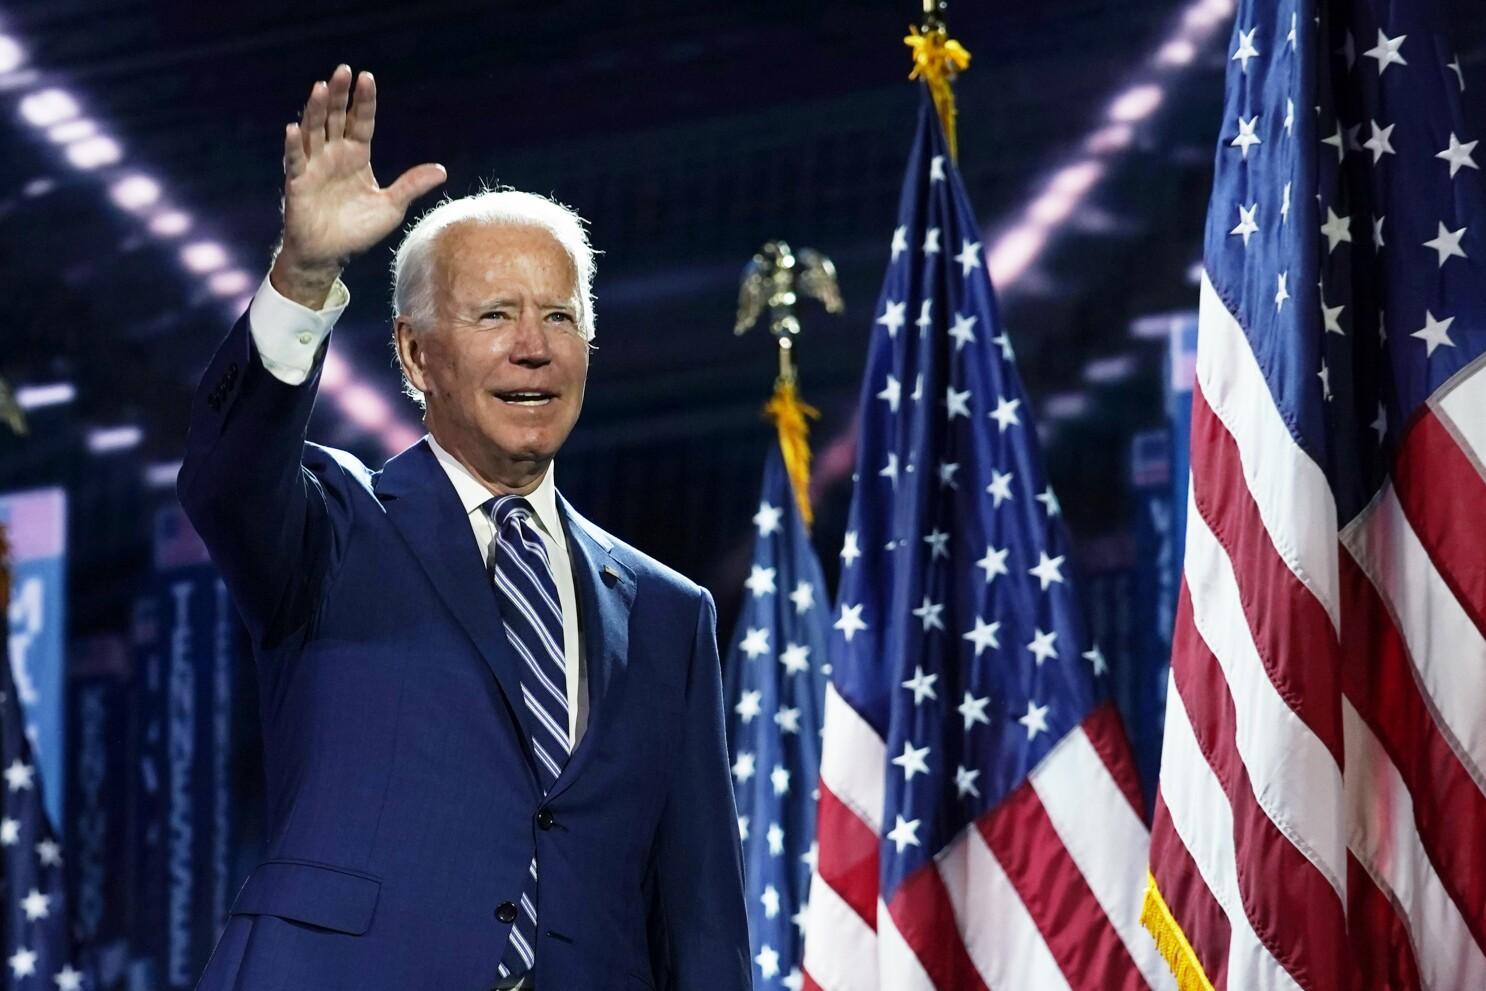 Dnc 2020 Thursday Lineup Joe Biden Andrew Yang Common Los Angeles Times